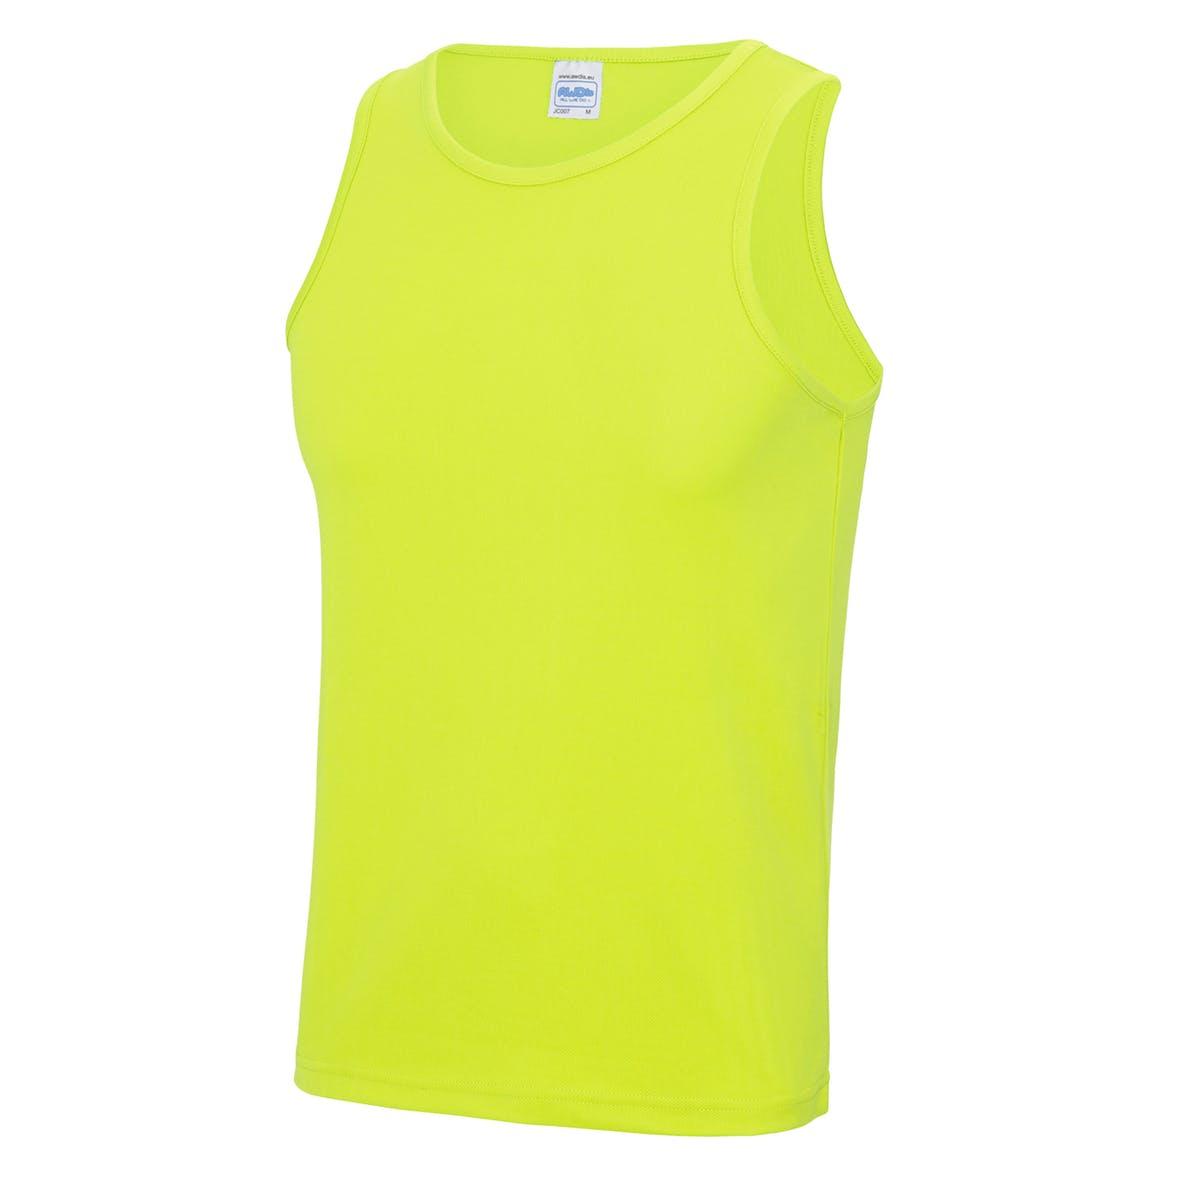 elec yellow sports vest